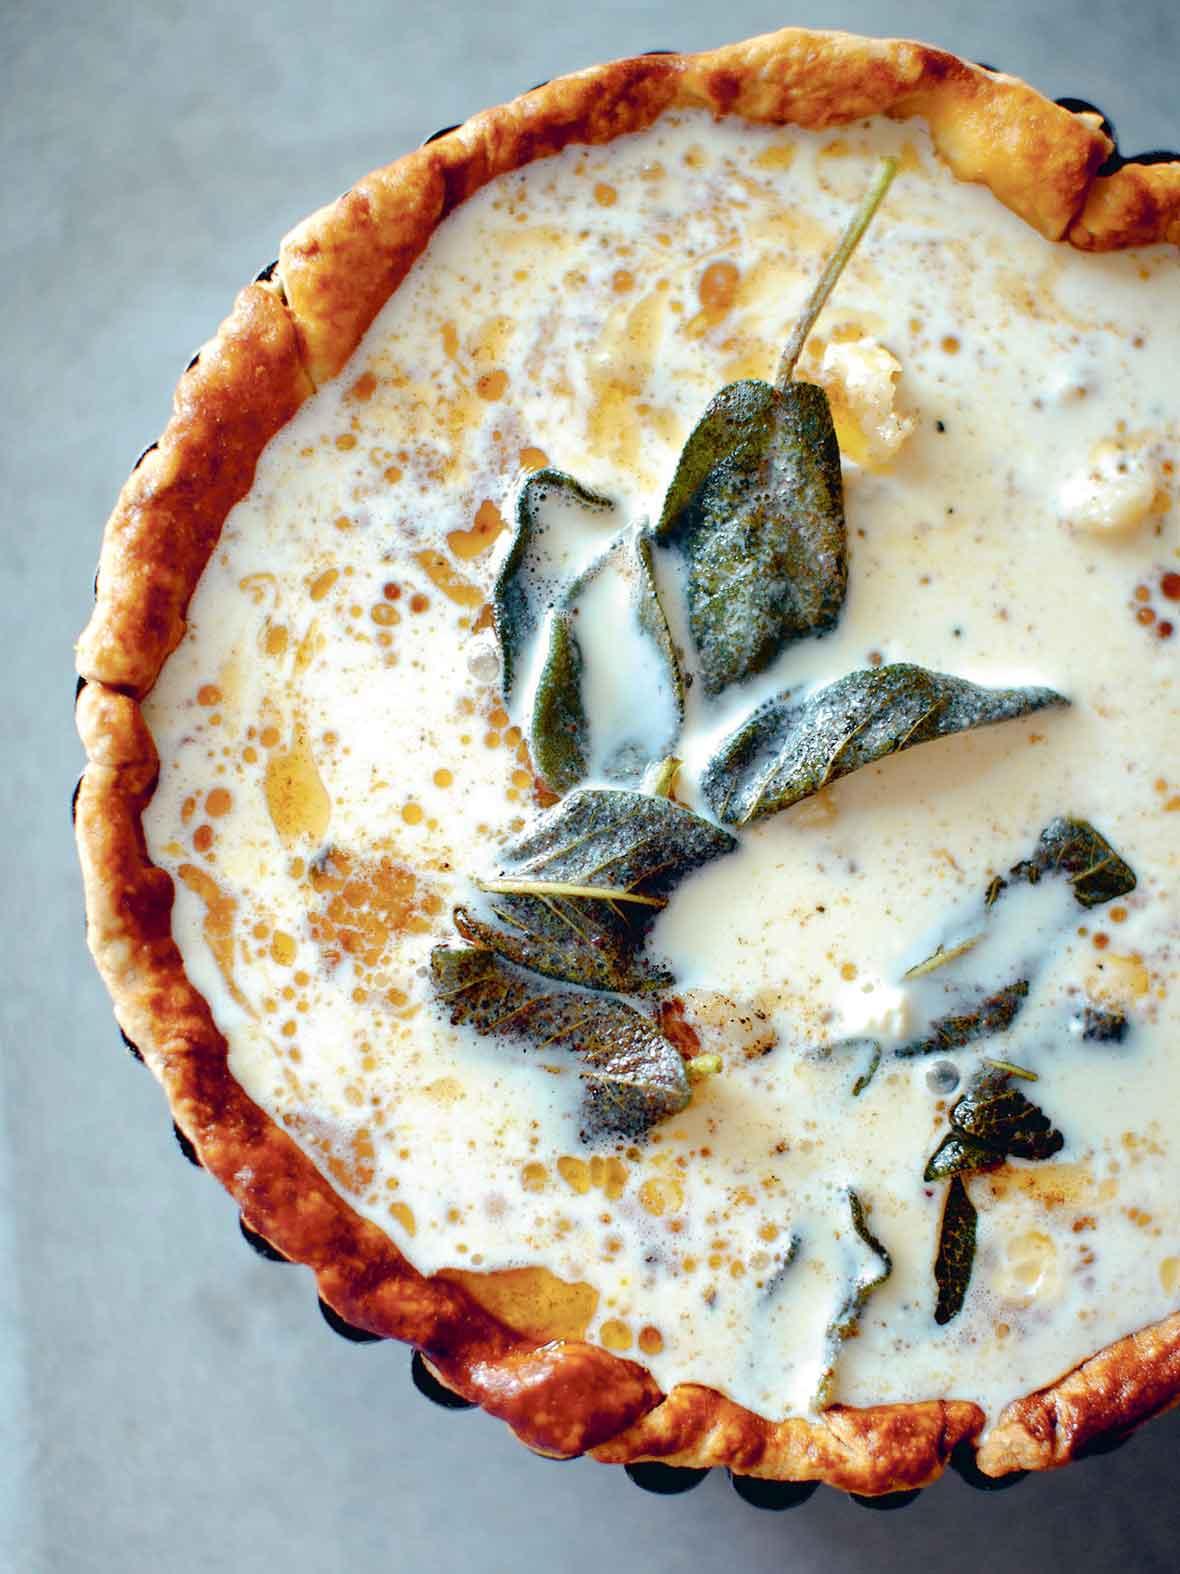 An uncooked butternut squash quiche.